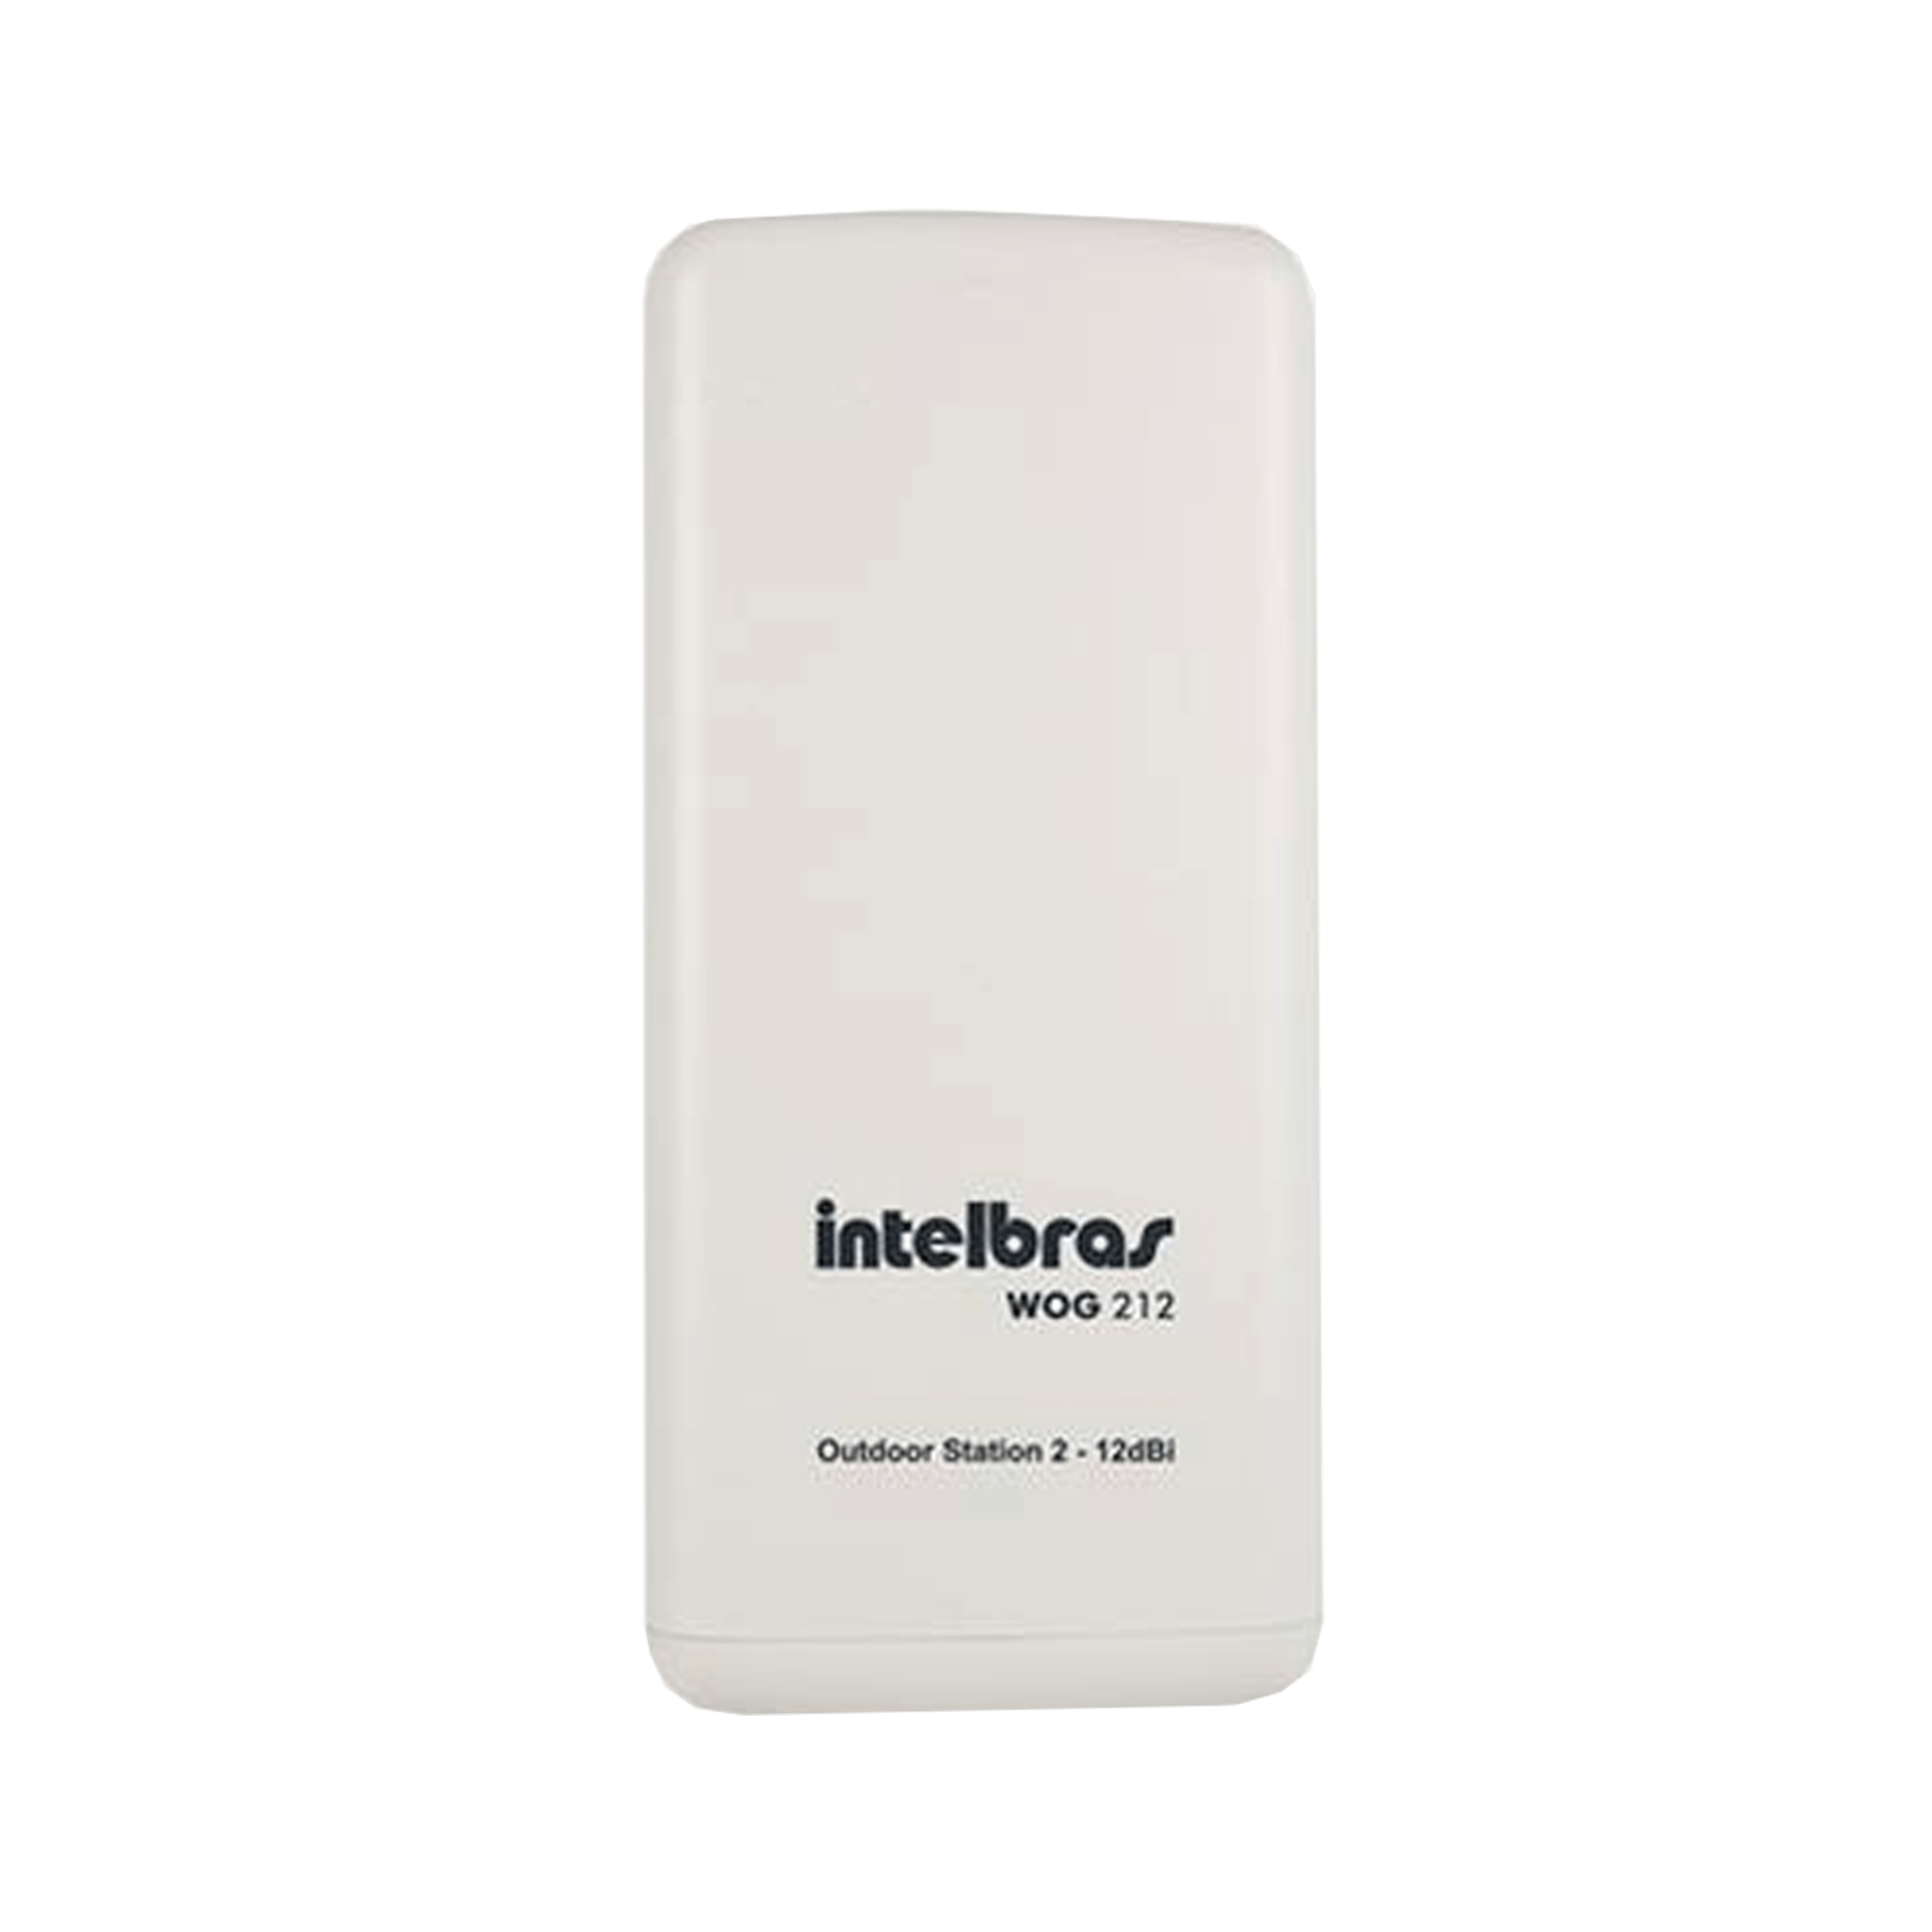 Antena Outdoor Station IntelBras 2 12dBi WOG 212